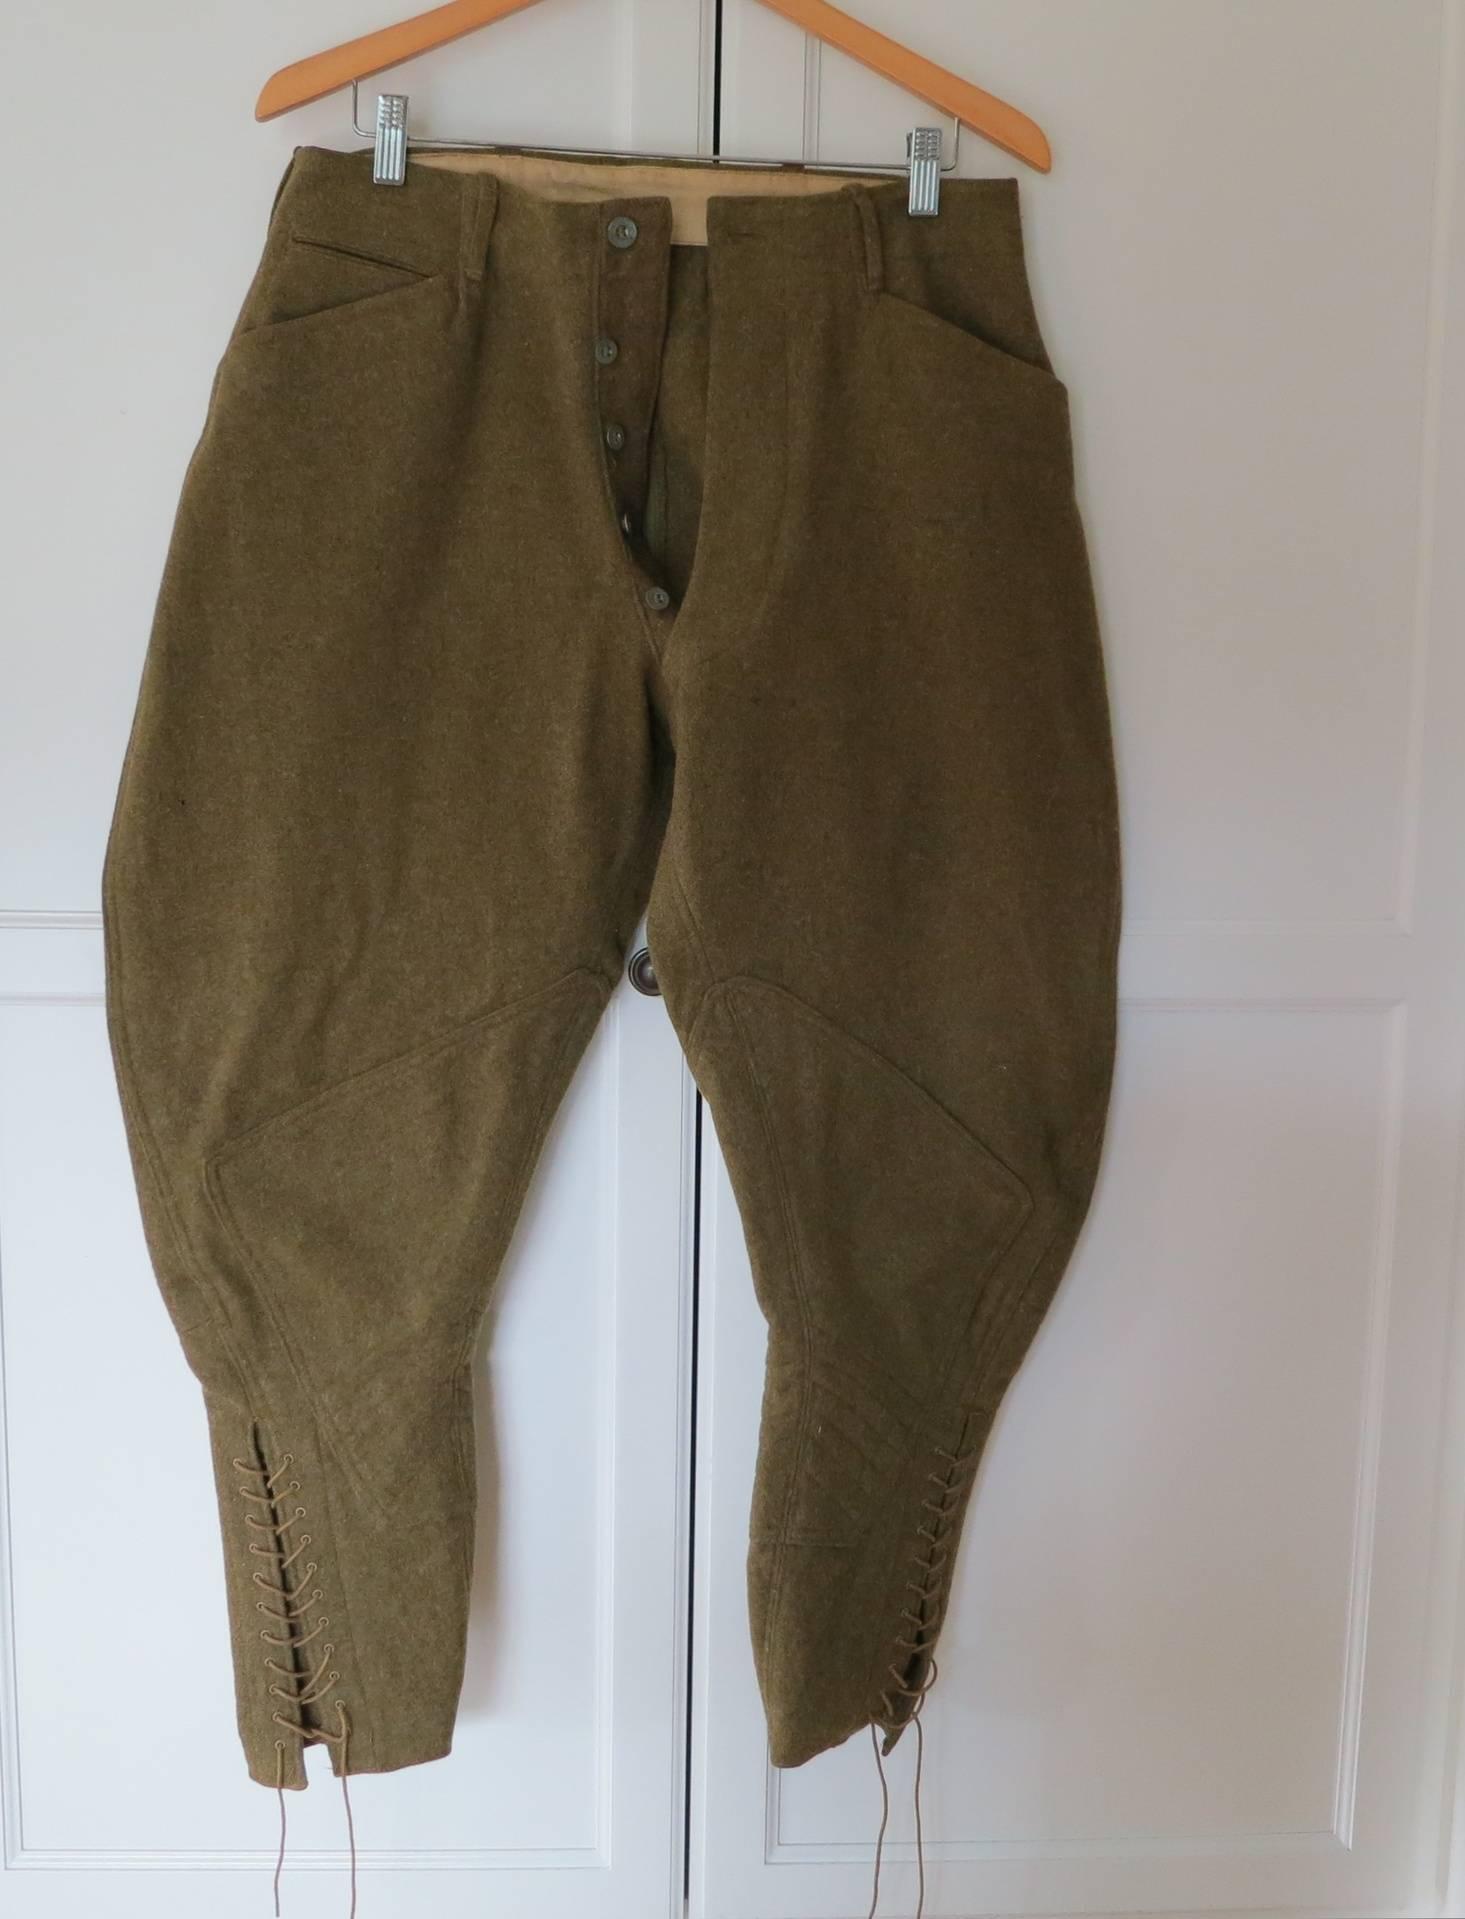 Judge Knott infantry breeches